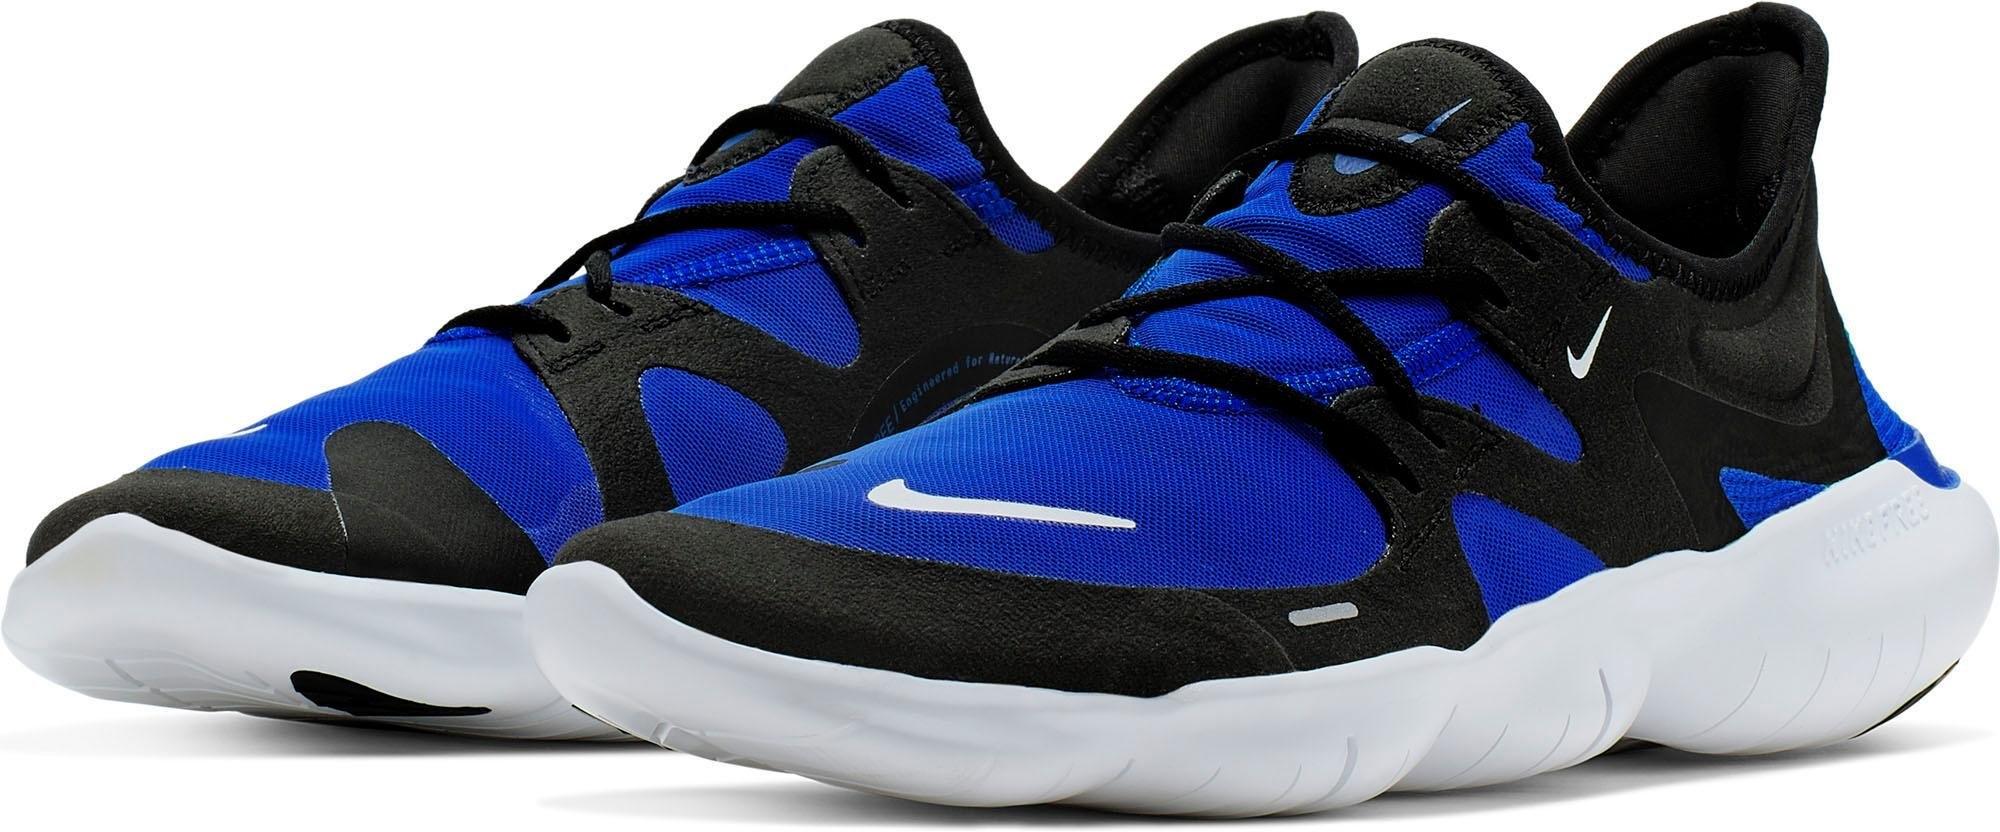 Nike runningschoenen »Free Run 5.0« veilig op otto.nl kopen